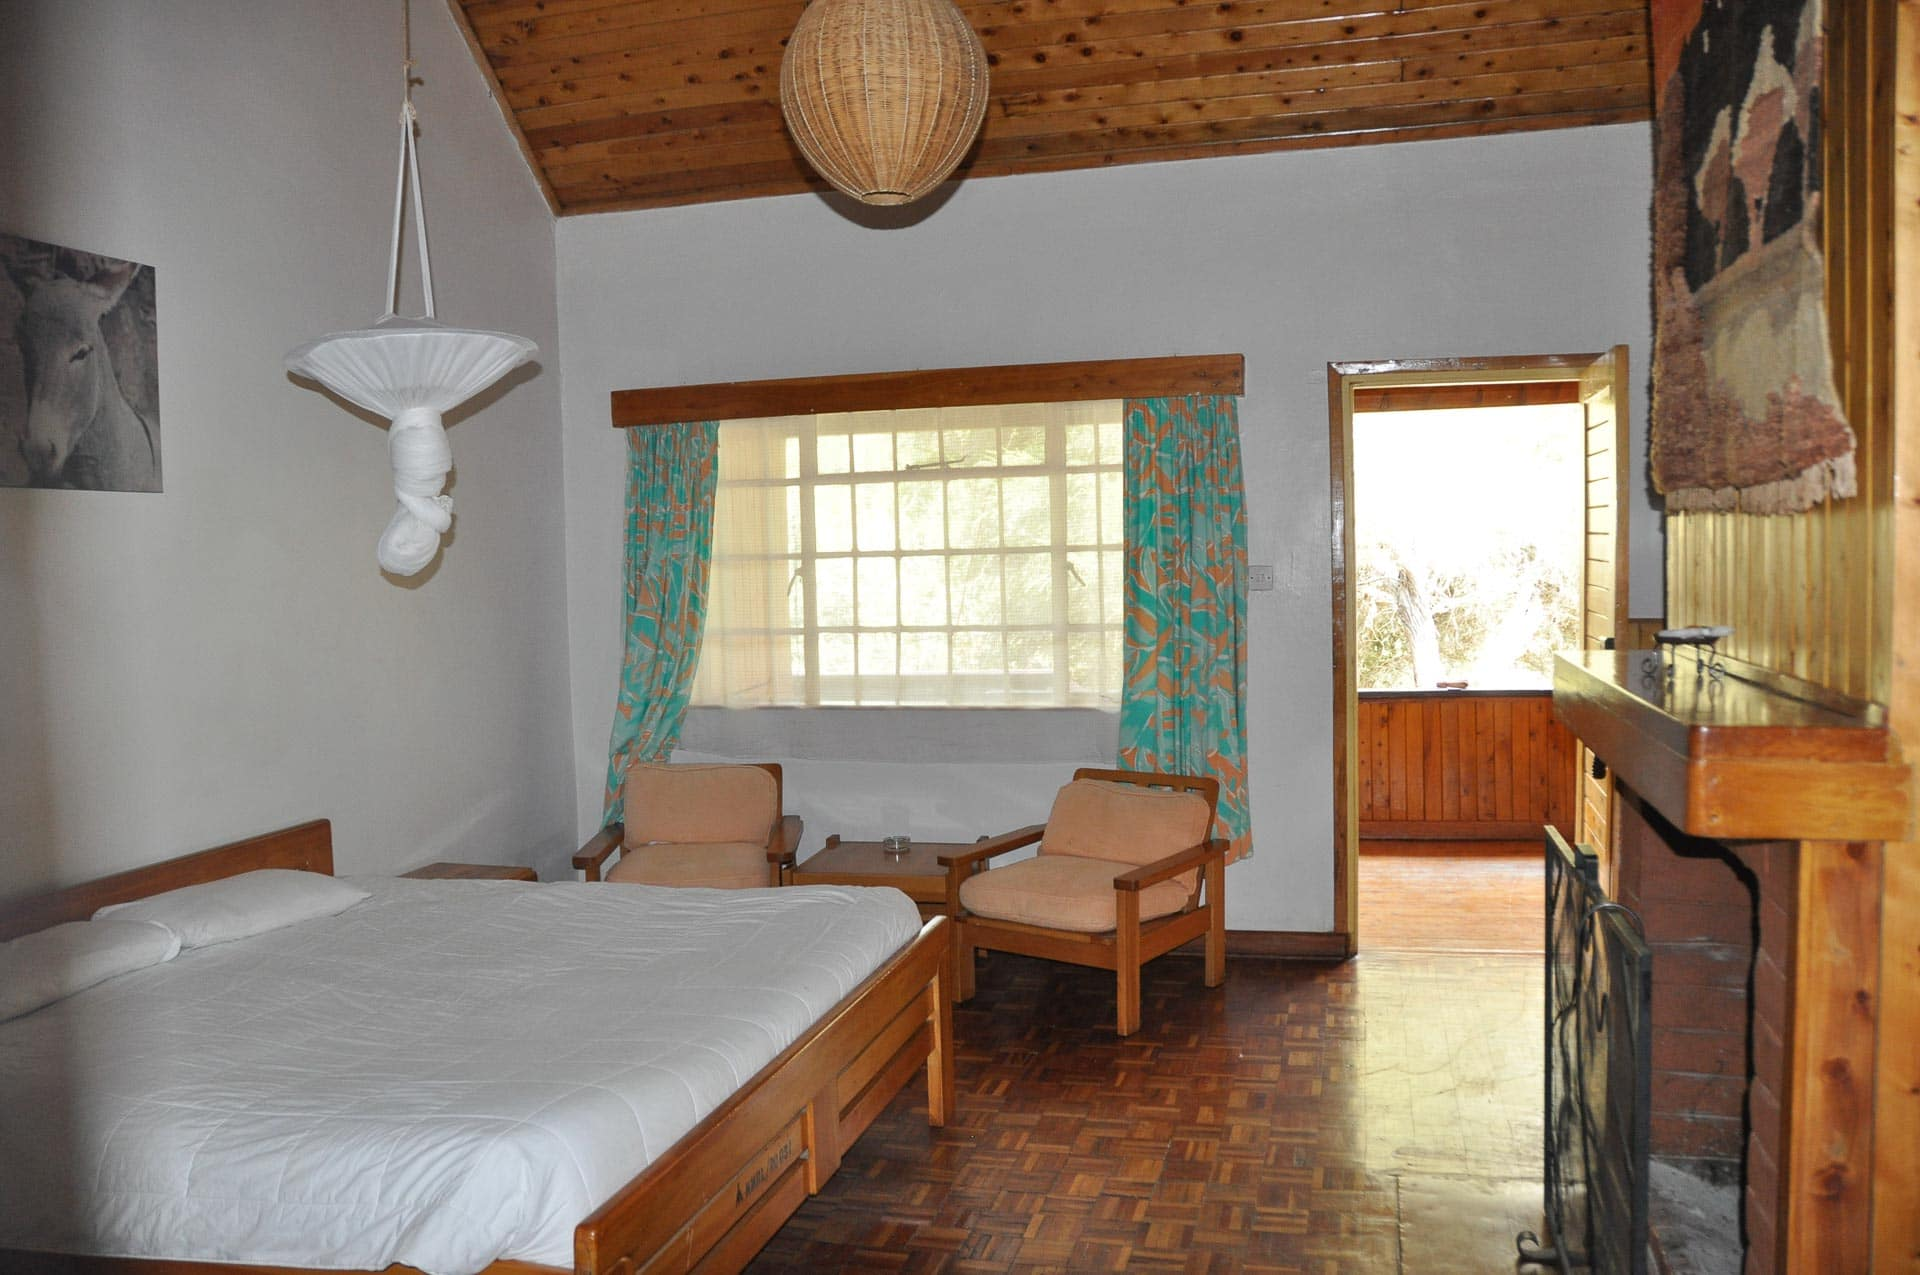 Naro-Moru-River-Lodge-Kenia-Globetrotter-Select-6